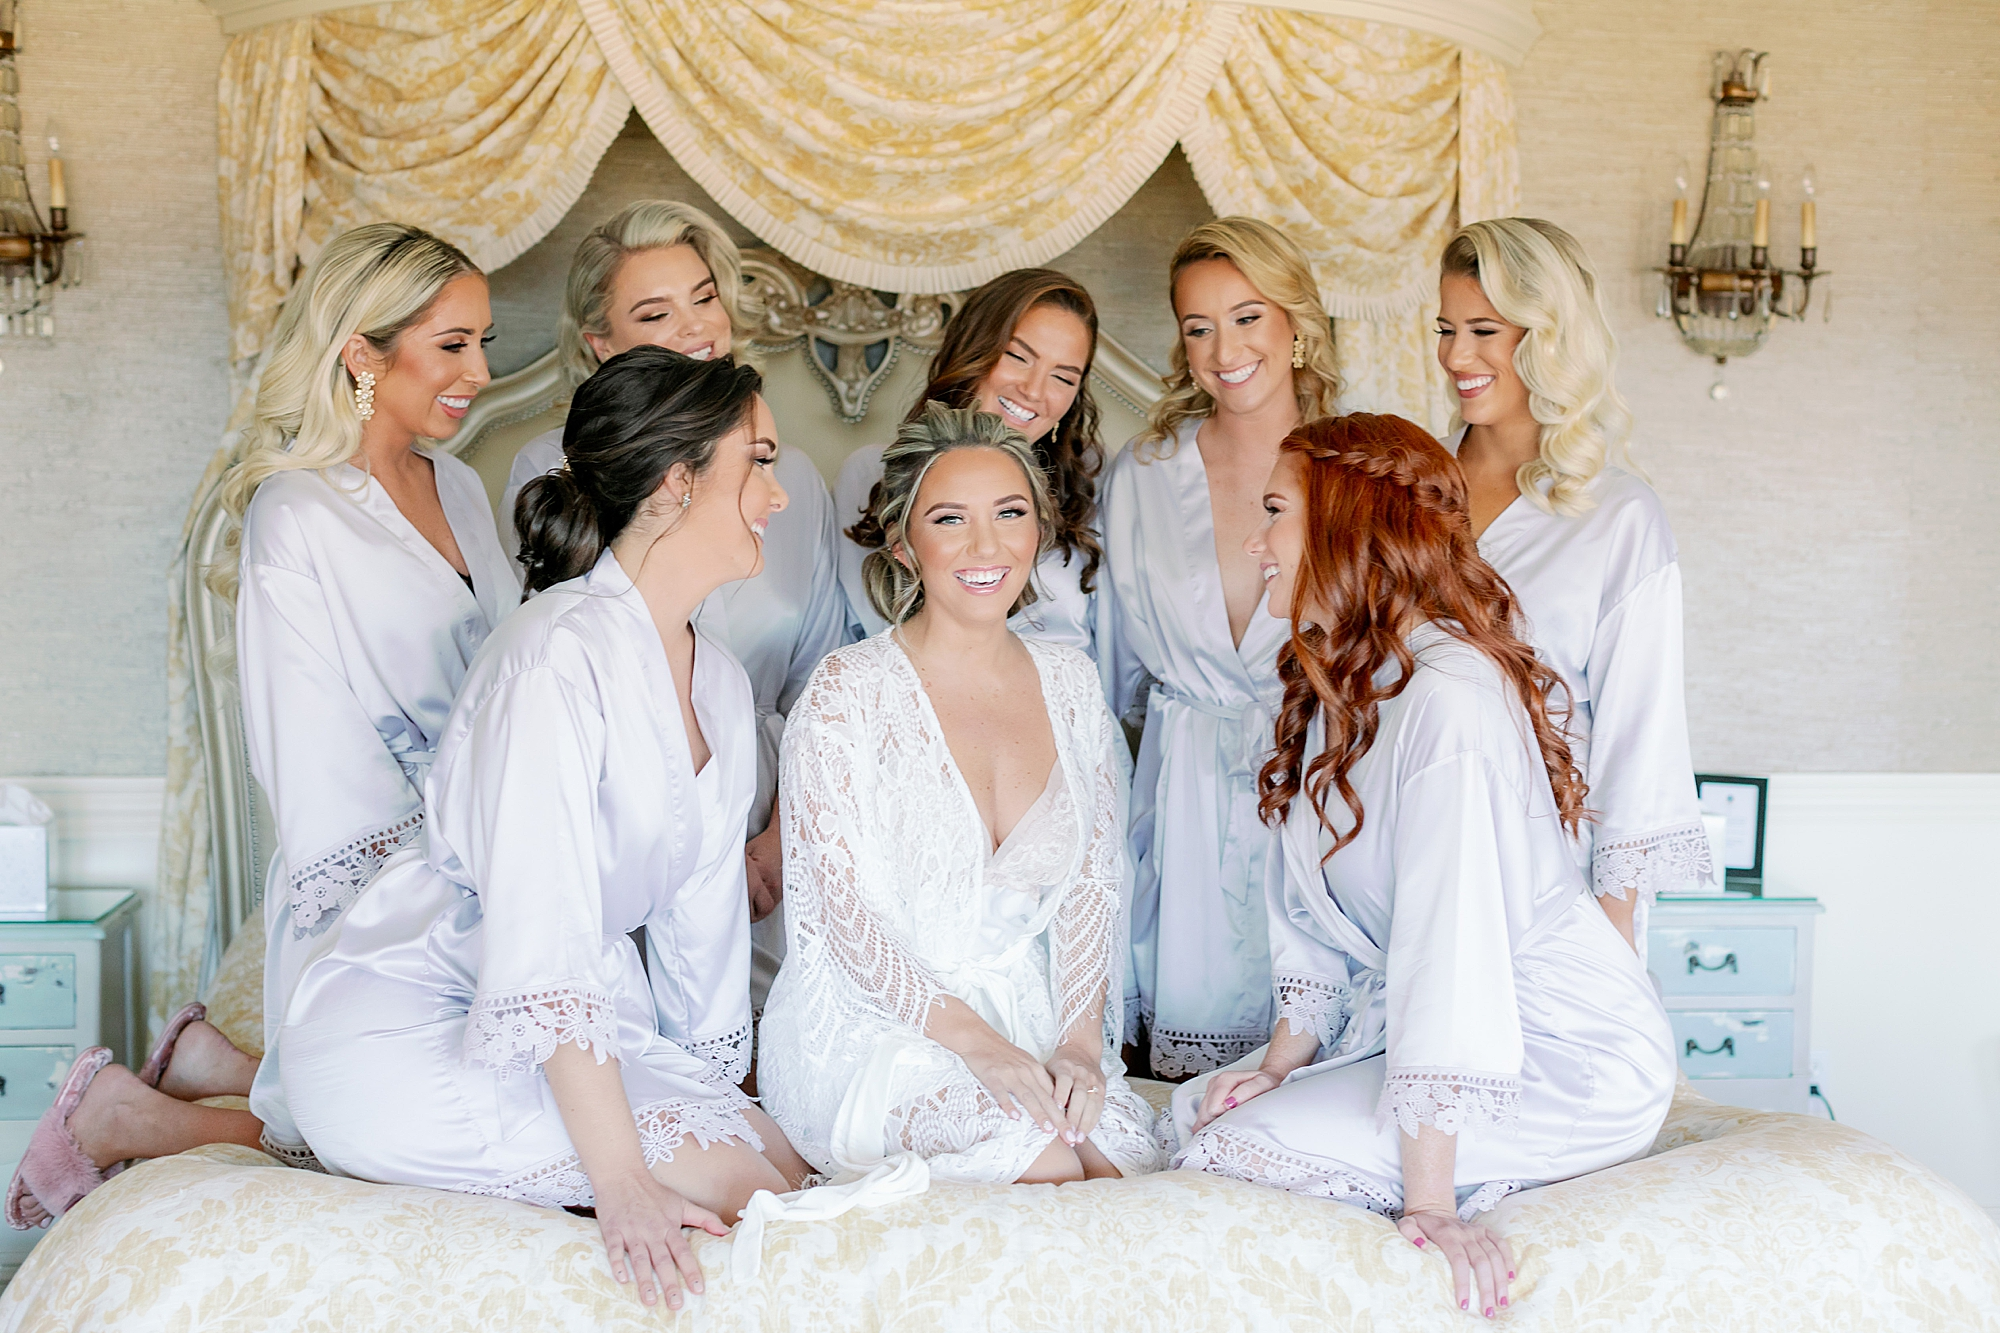 Bonnet Island Estate Film Wedding Photography by Magdalena Studios 0009